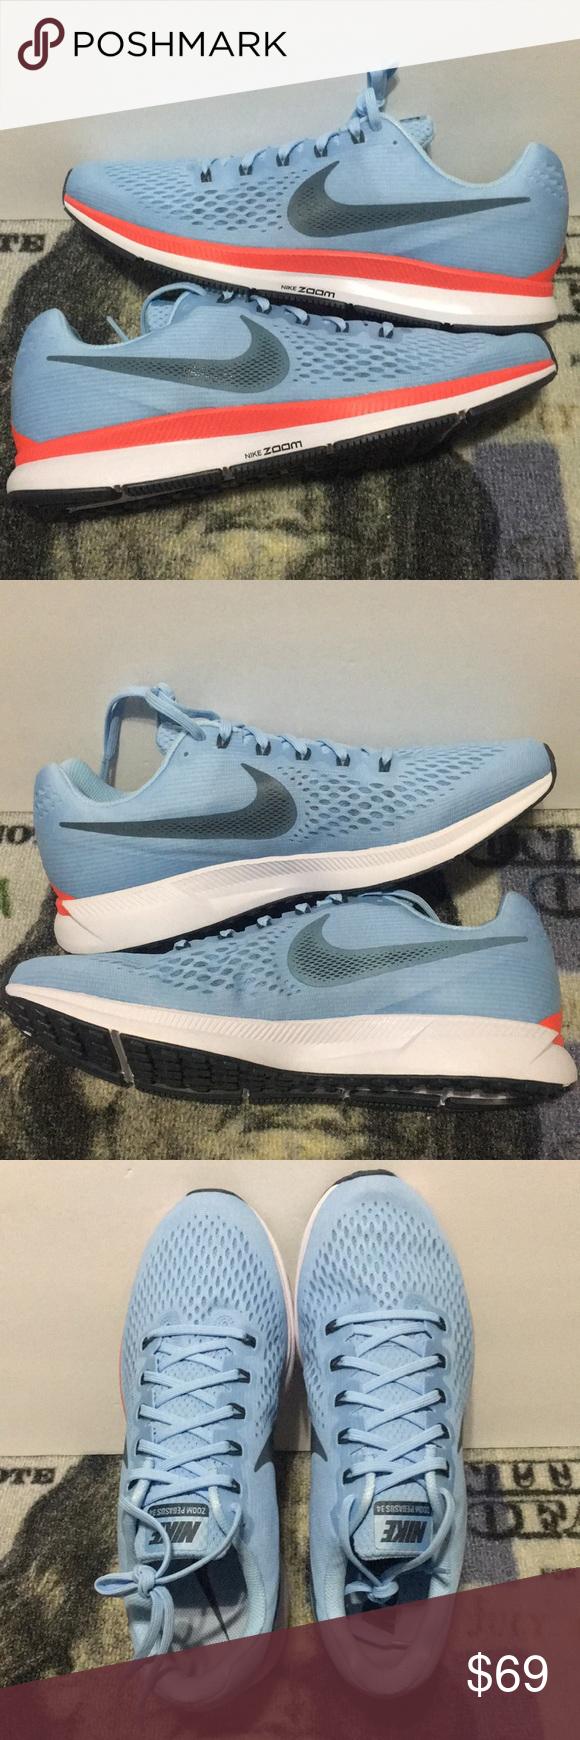 d8405f3e11f293 Nike Air Zoom Pegasus 34 Ice Blue Mens Sz 12.5 US New WITHOUT Box Nike Air